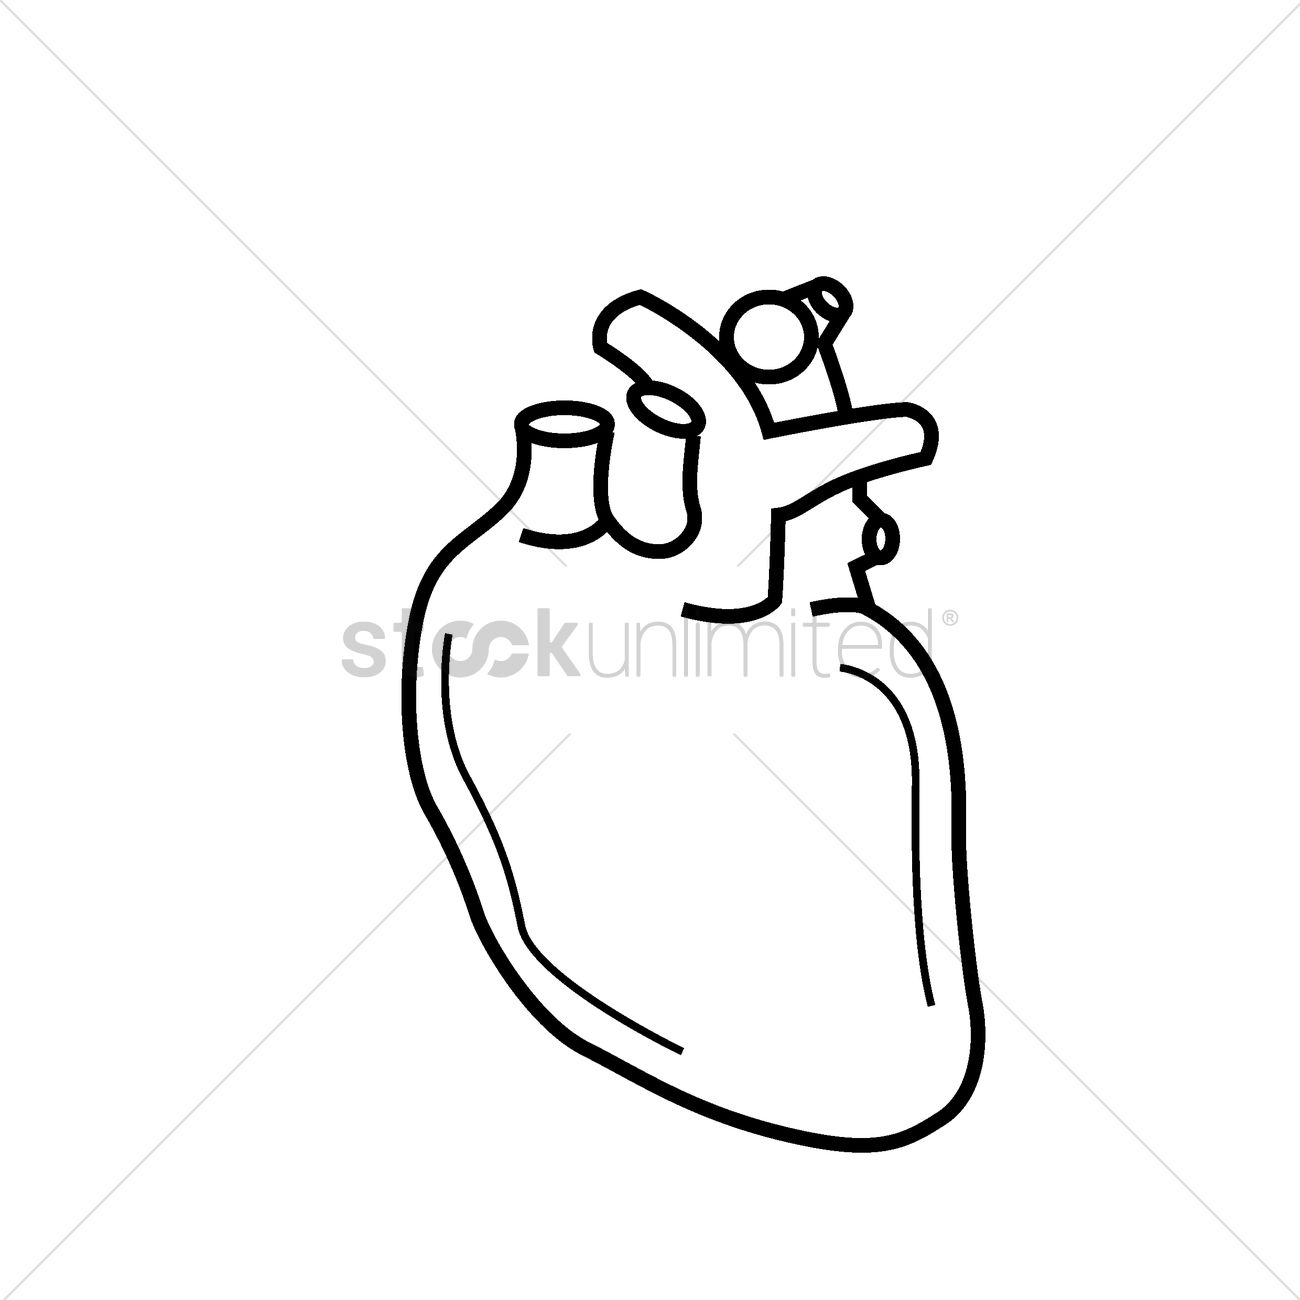 Human heart Vector Image - 1523043 | StockUnlimited